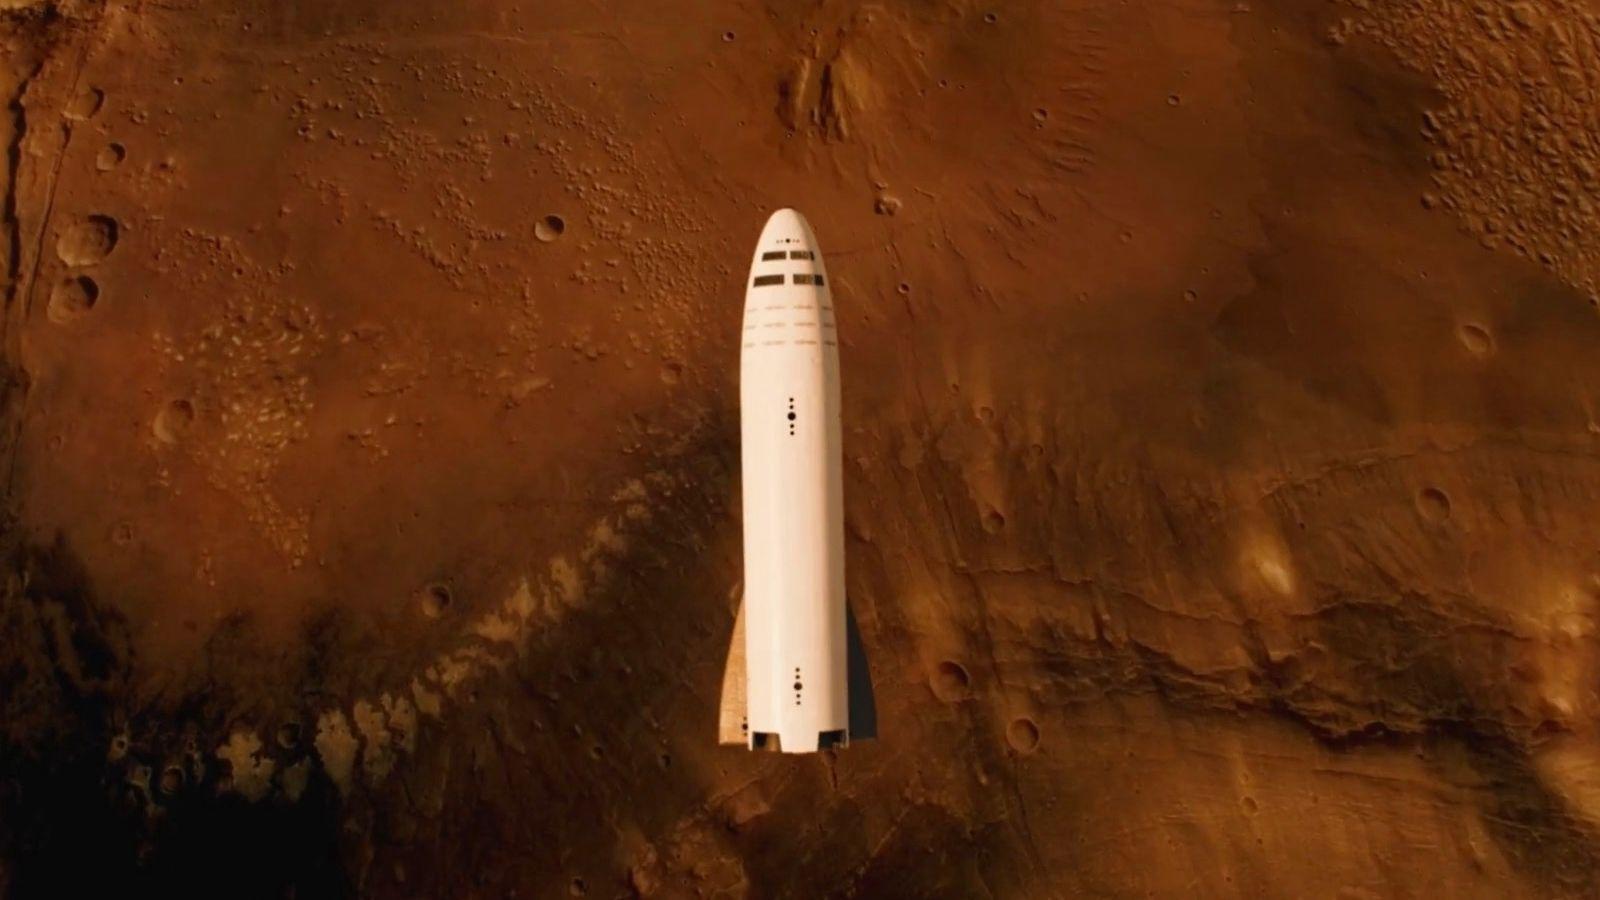 Spacex Bfr Spaceship Above Mars Spacex Starship Mars